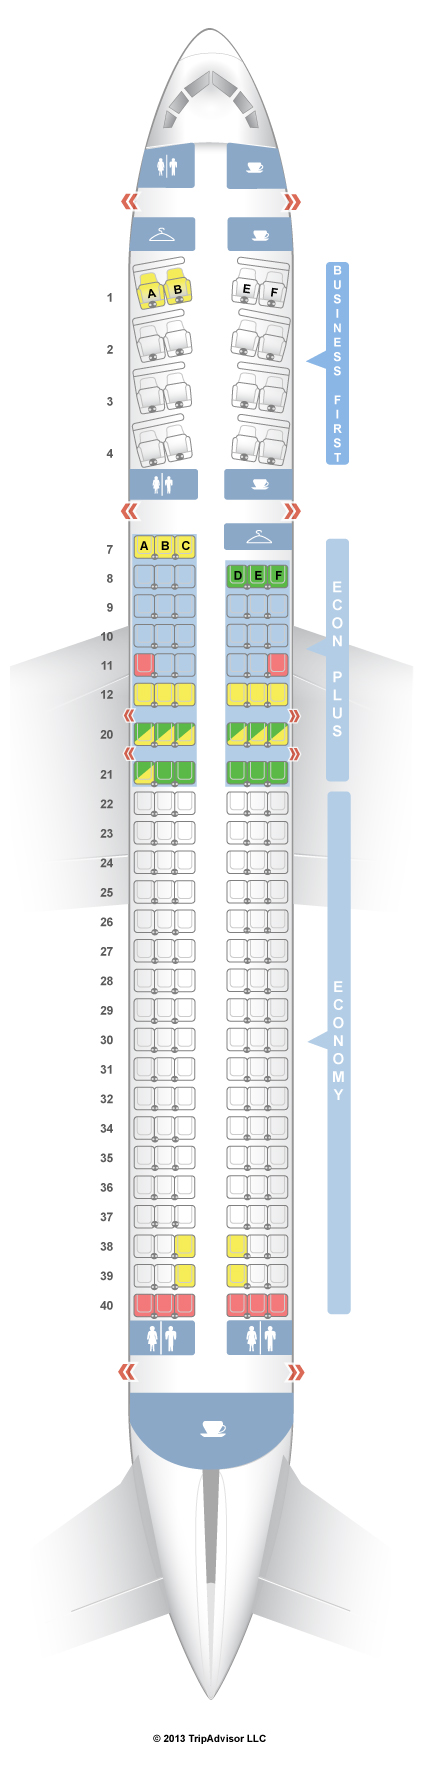 Seatguru Seat Map United Boeing 757 200 752 V2 Intl